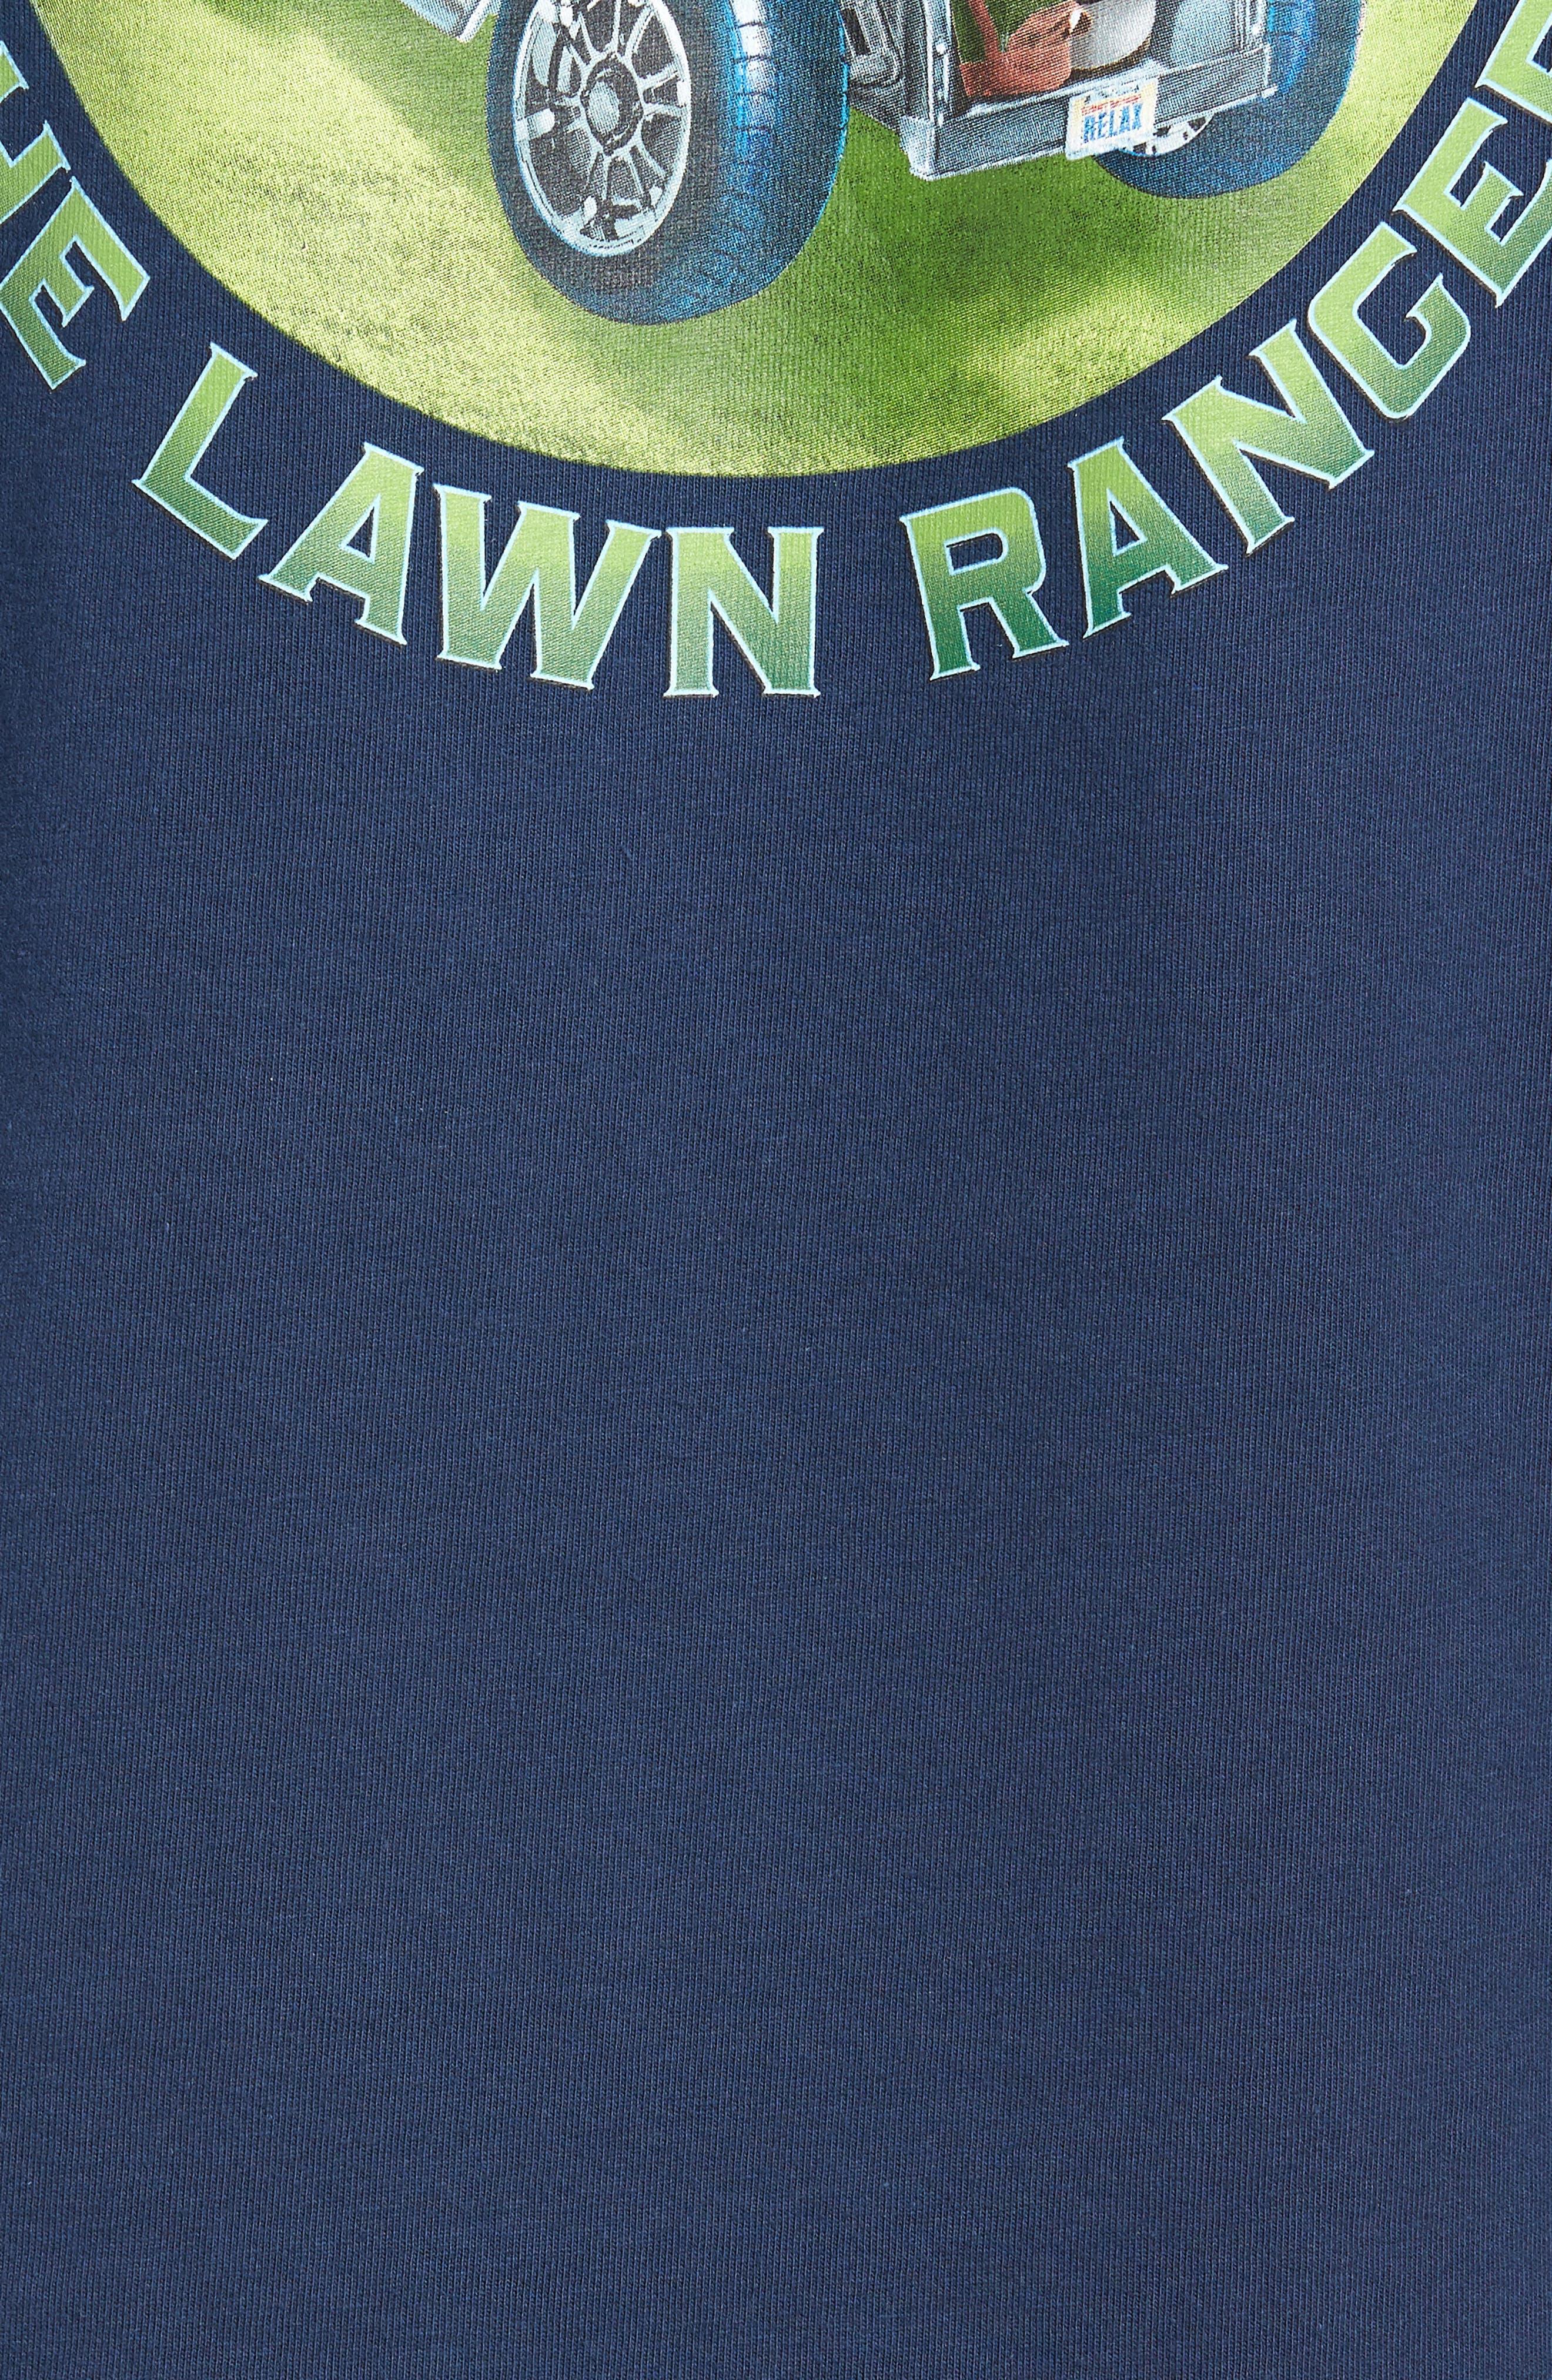 TOMMY BAHAMA,                             The Lawn Ranger T-Shirt,                             Alternate thumbnail 5, color,                             400